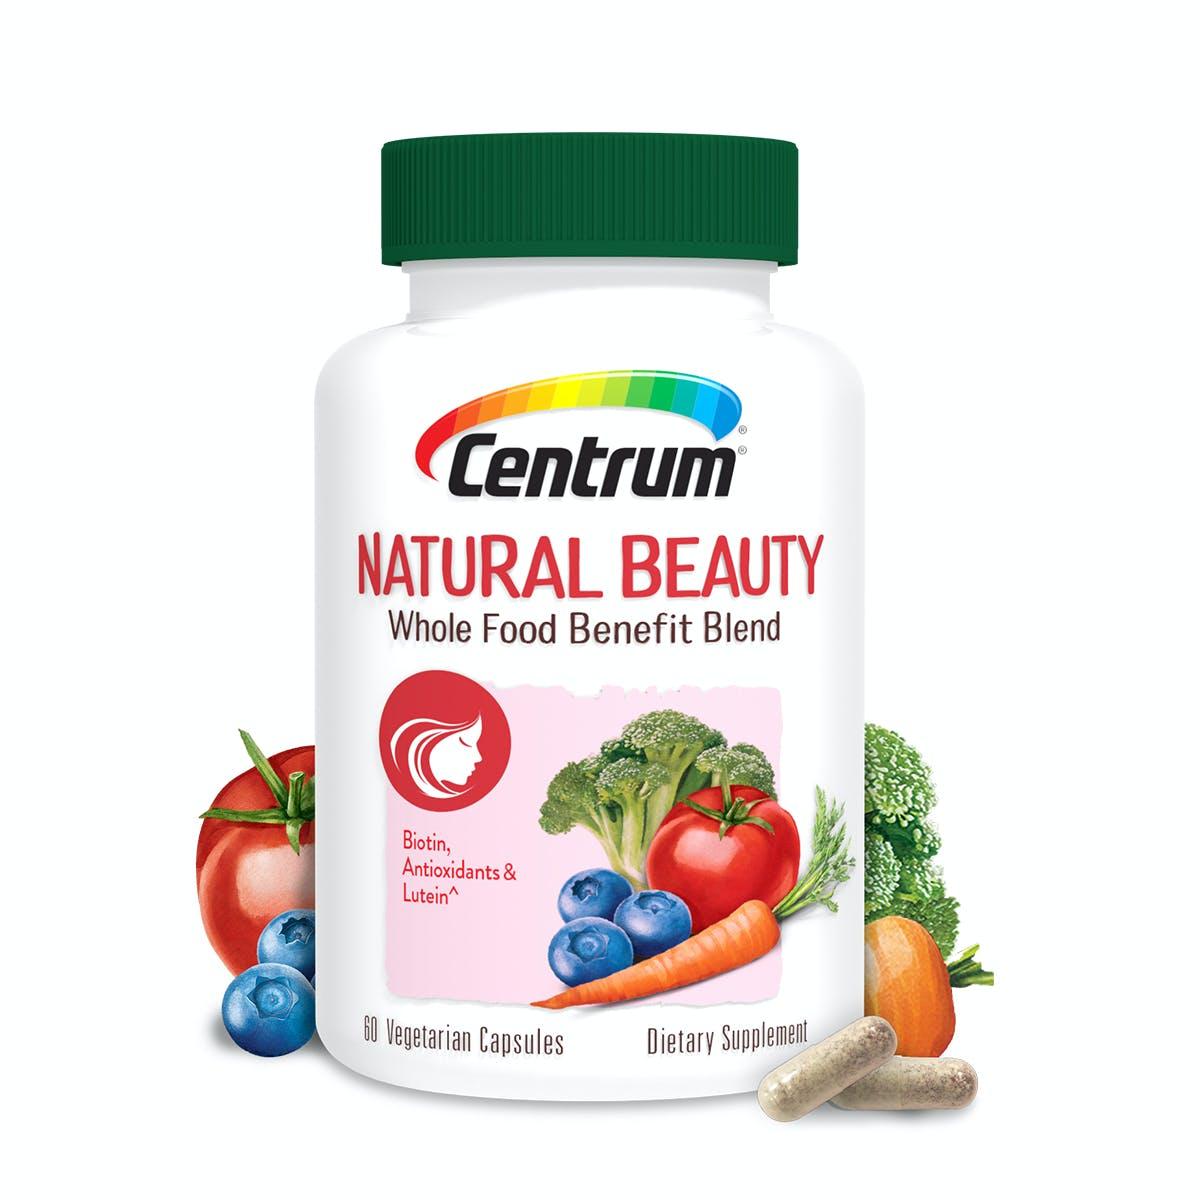 Centrum Natural Beauty Whole Food Benefit Blend